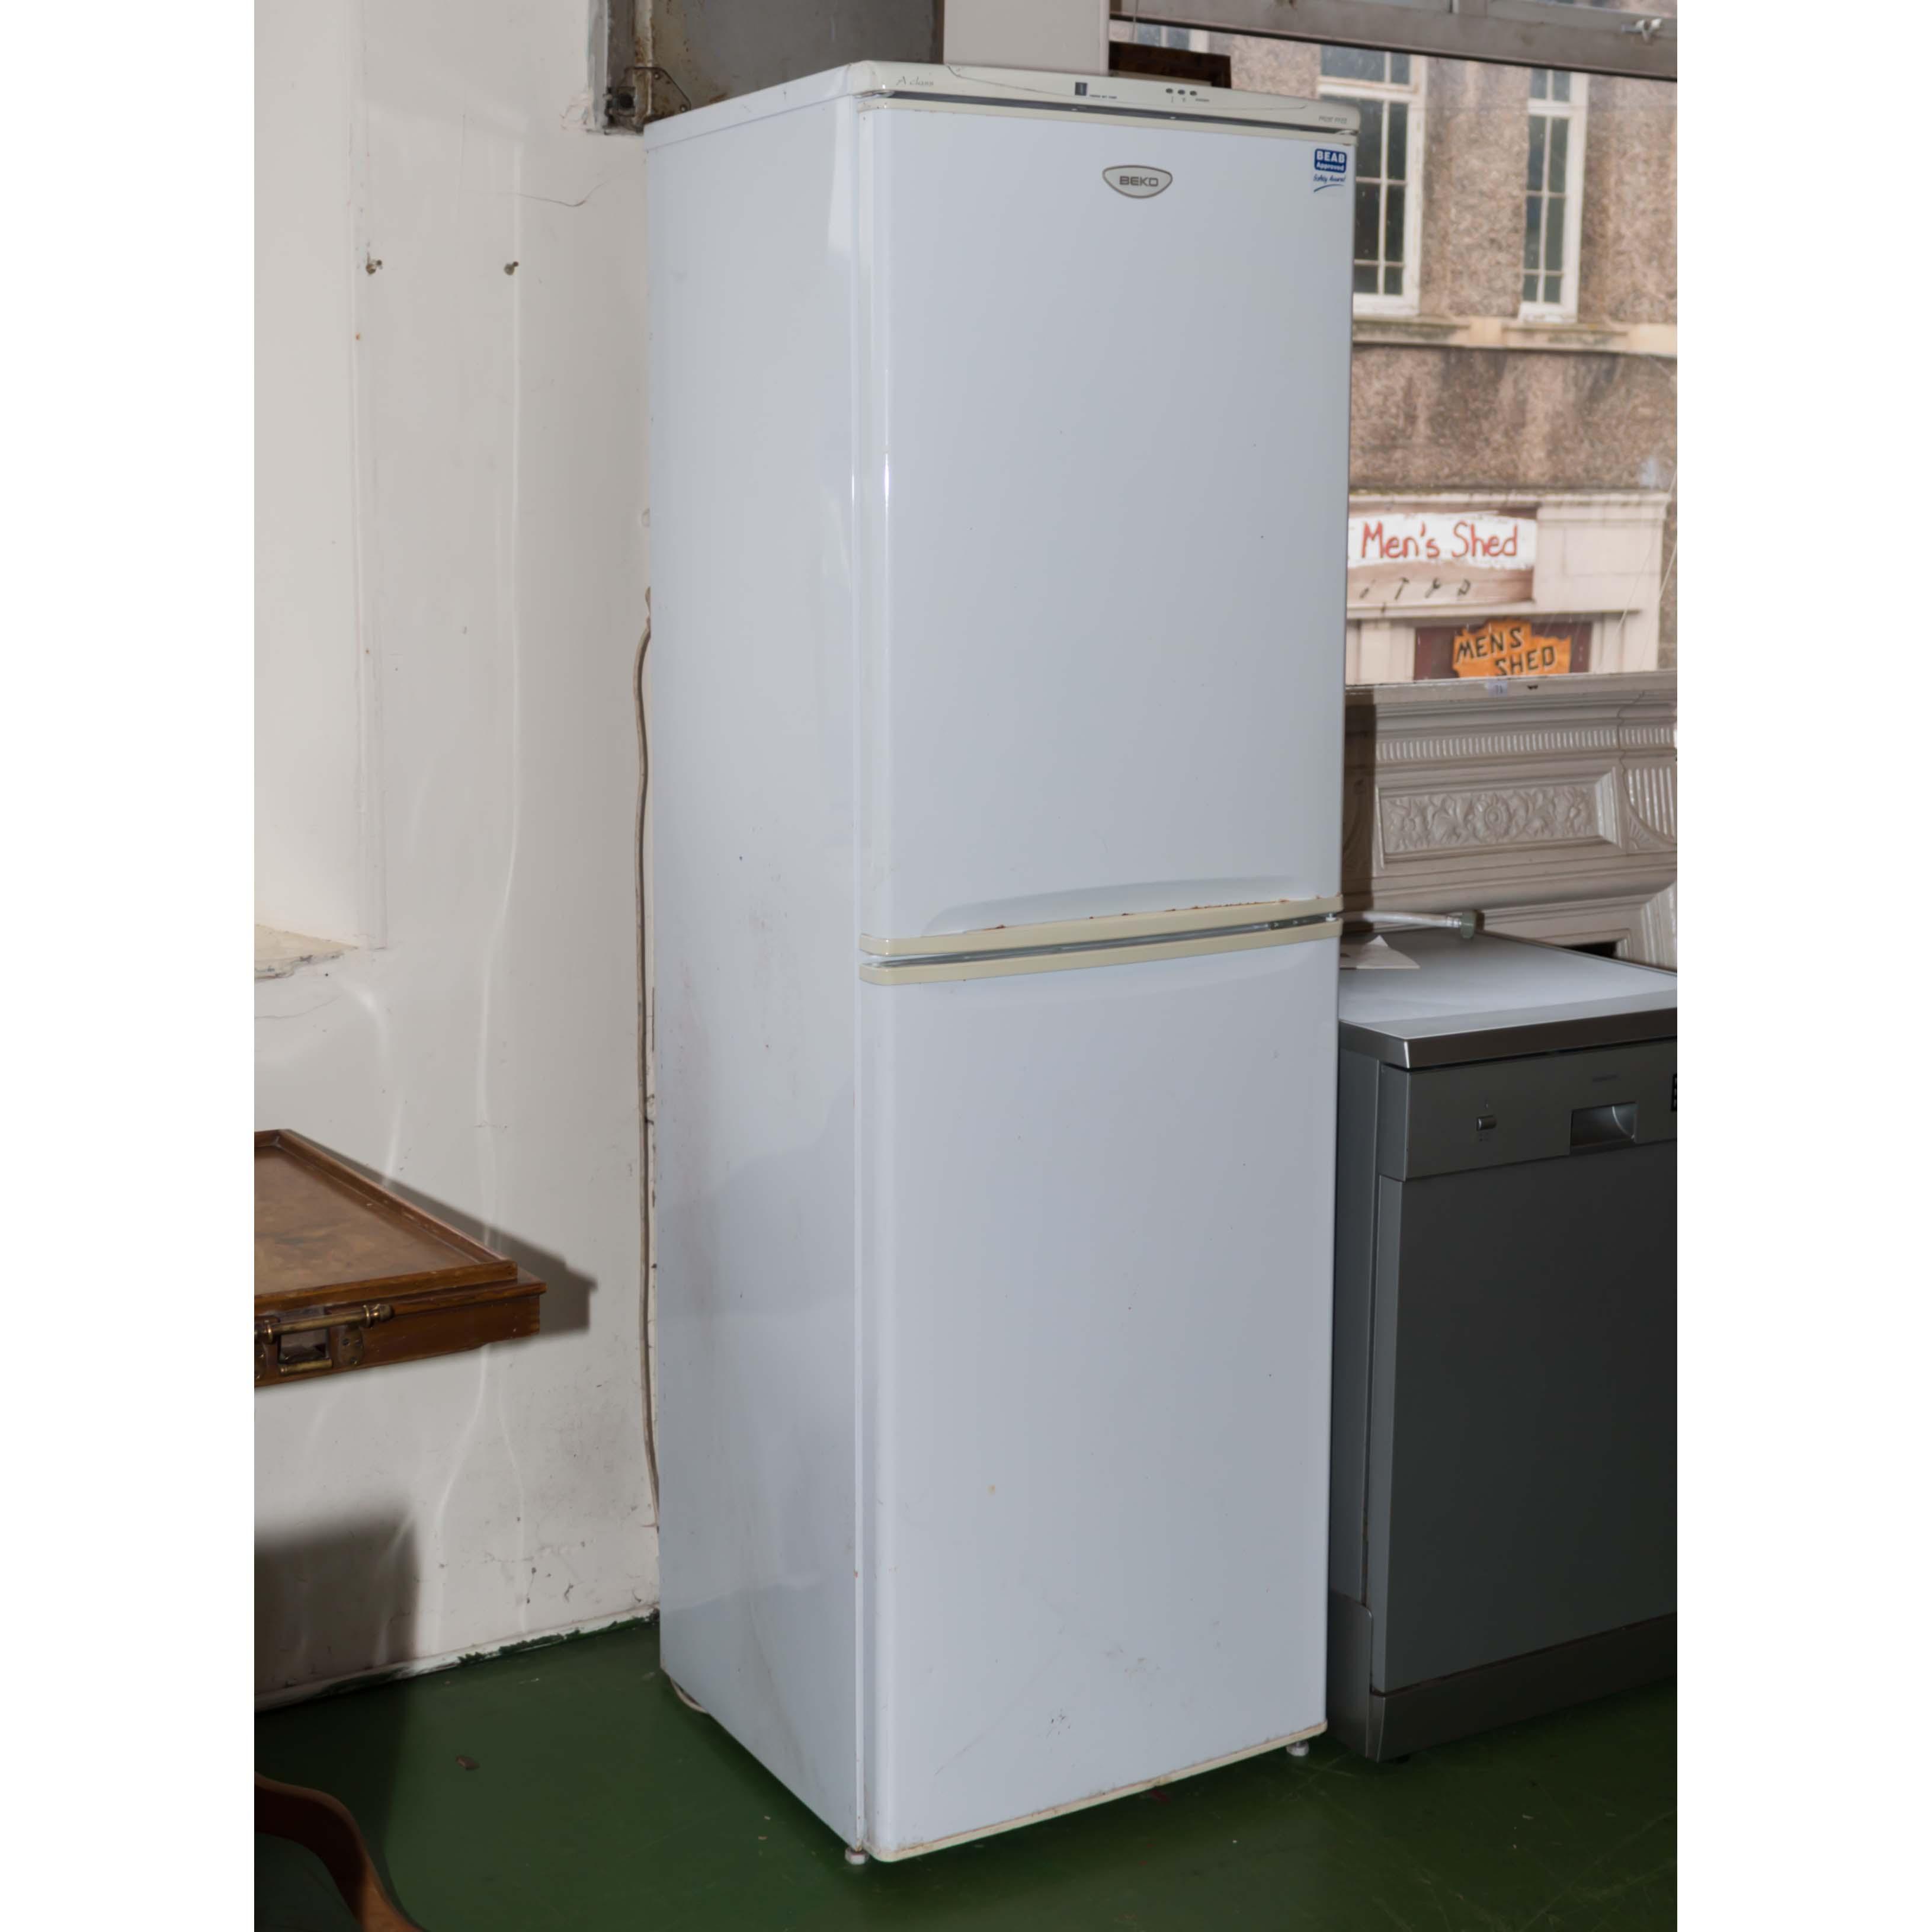 Lot 55 - A Beko fridge freezer